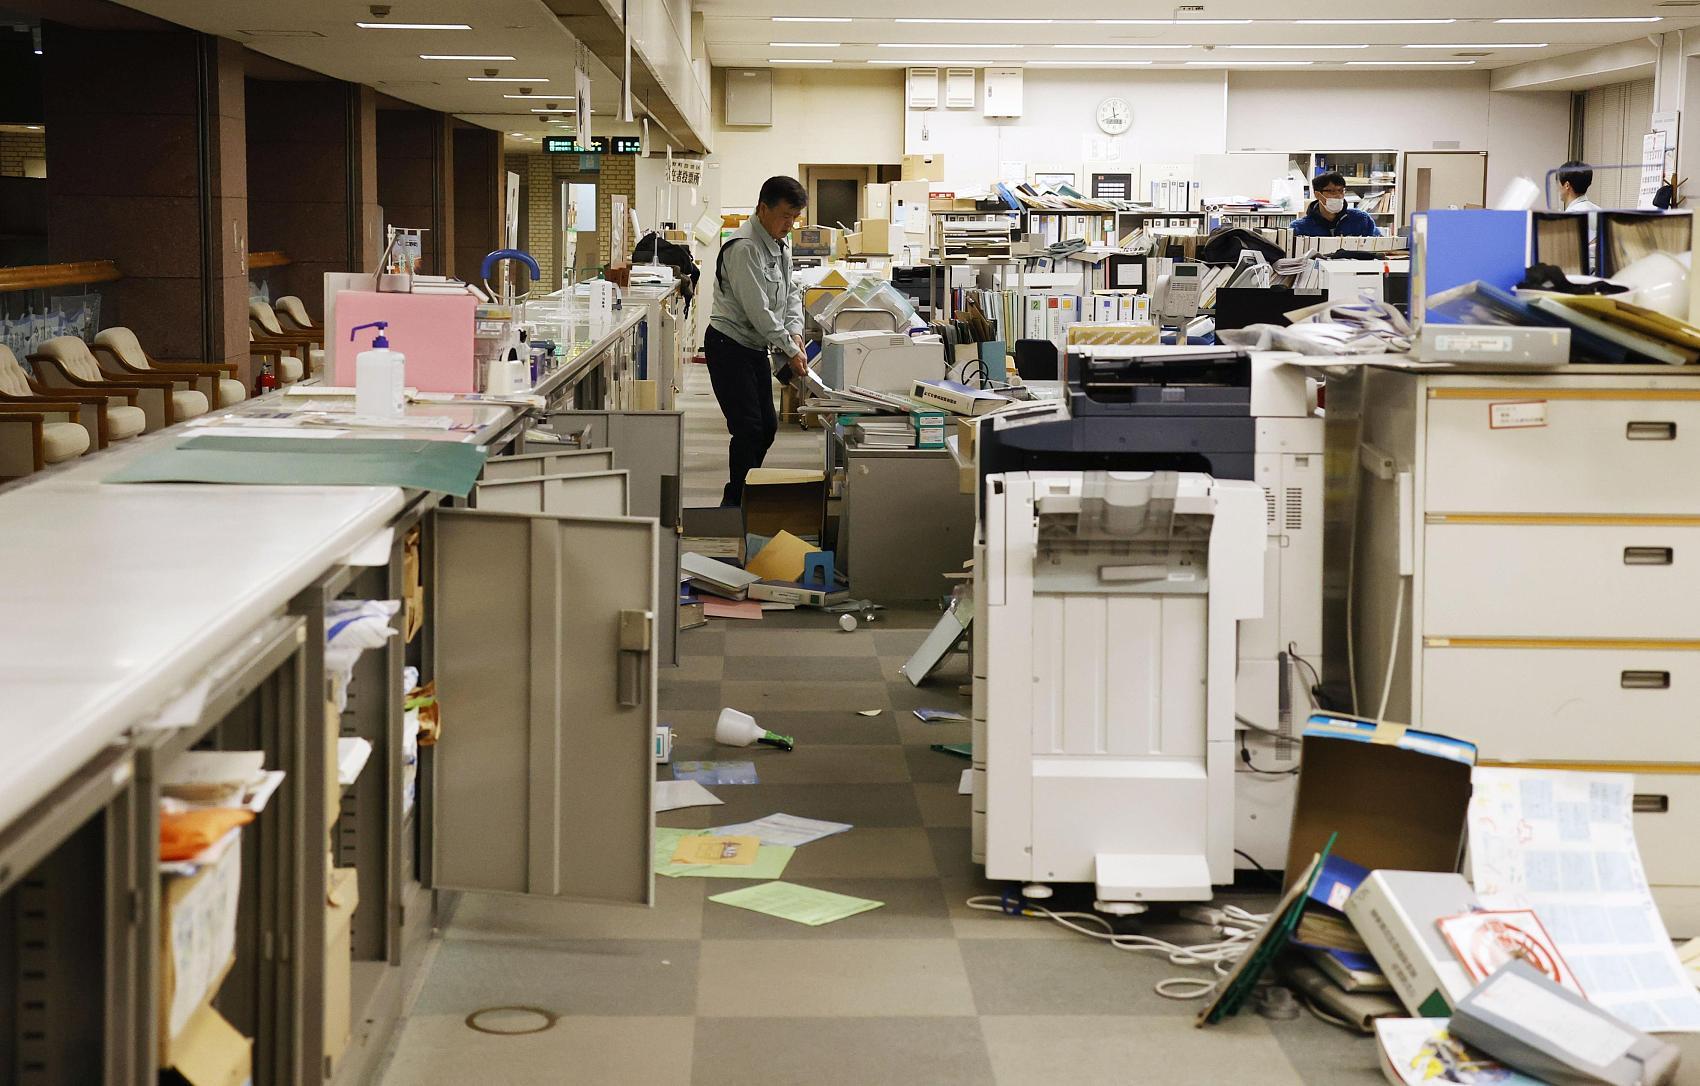 At least 30 injured after 7.3-magnitude quake strikes off northeastern Japan